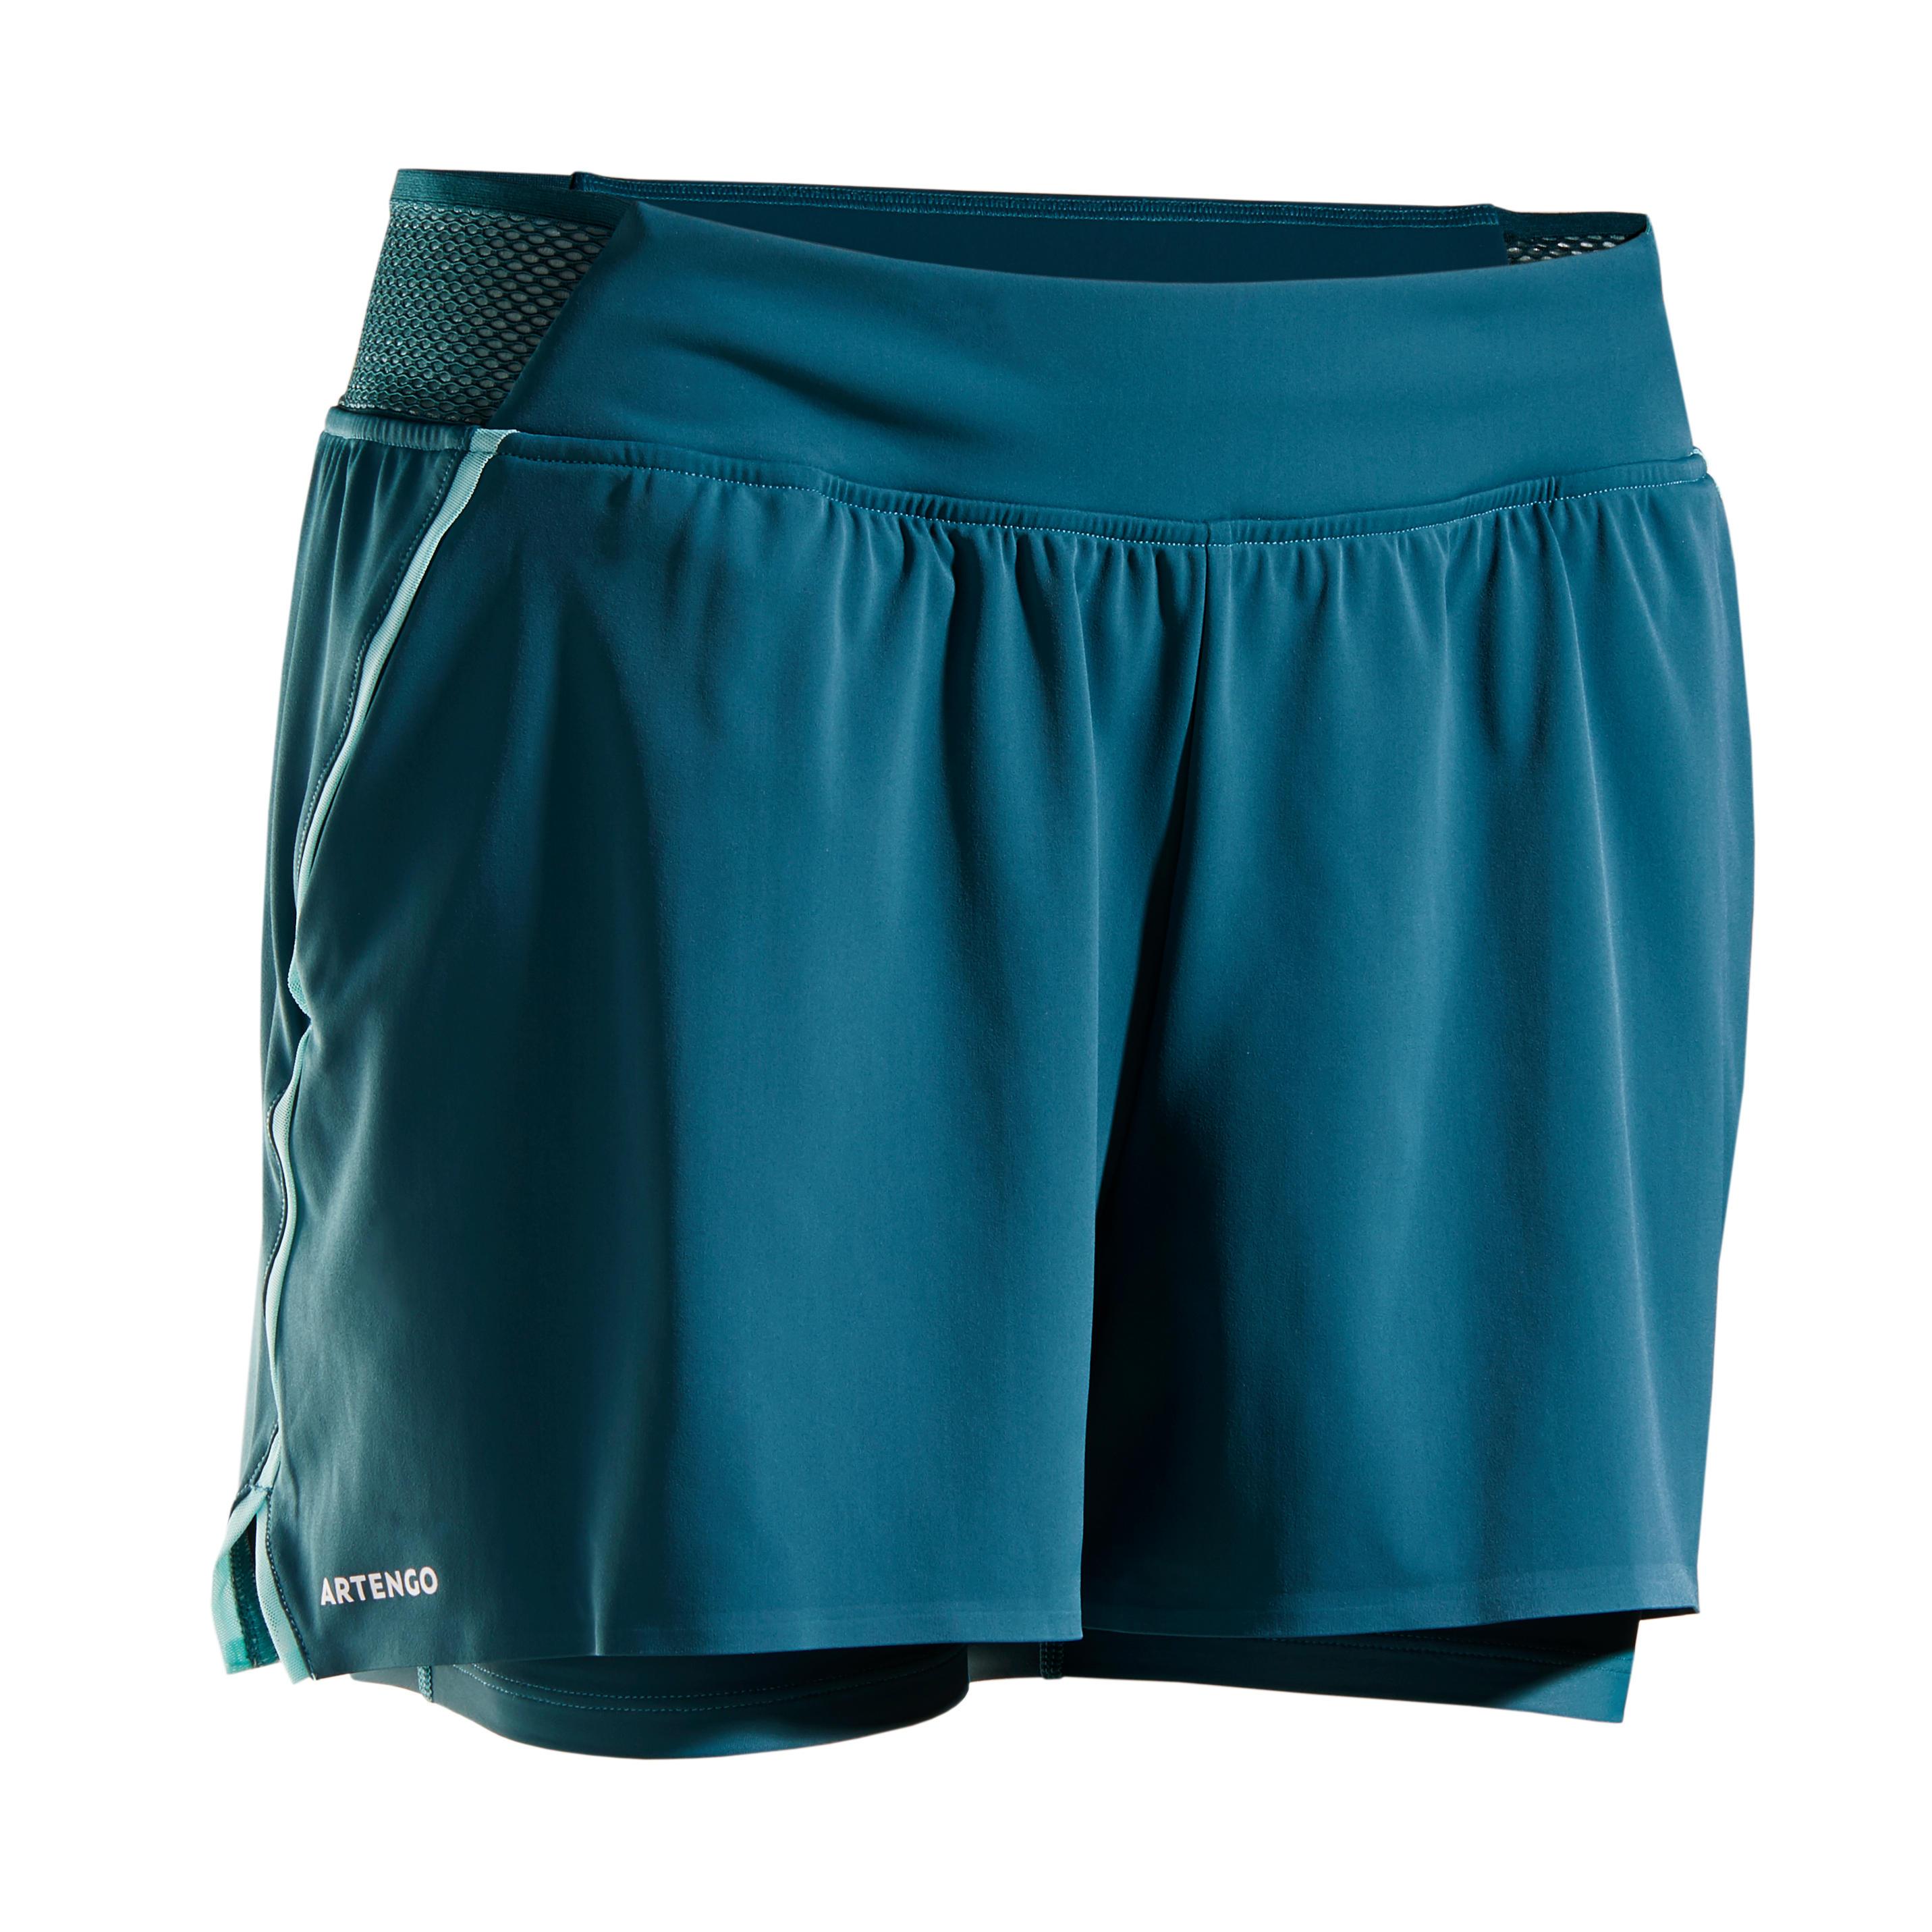 Tennisshorts SH Light 900 Damen | Sportbekleidung > Sporthosen > Tennisshorts | Artengo